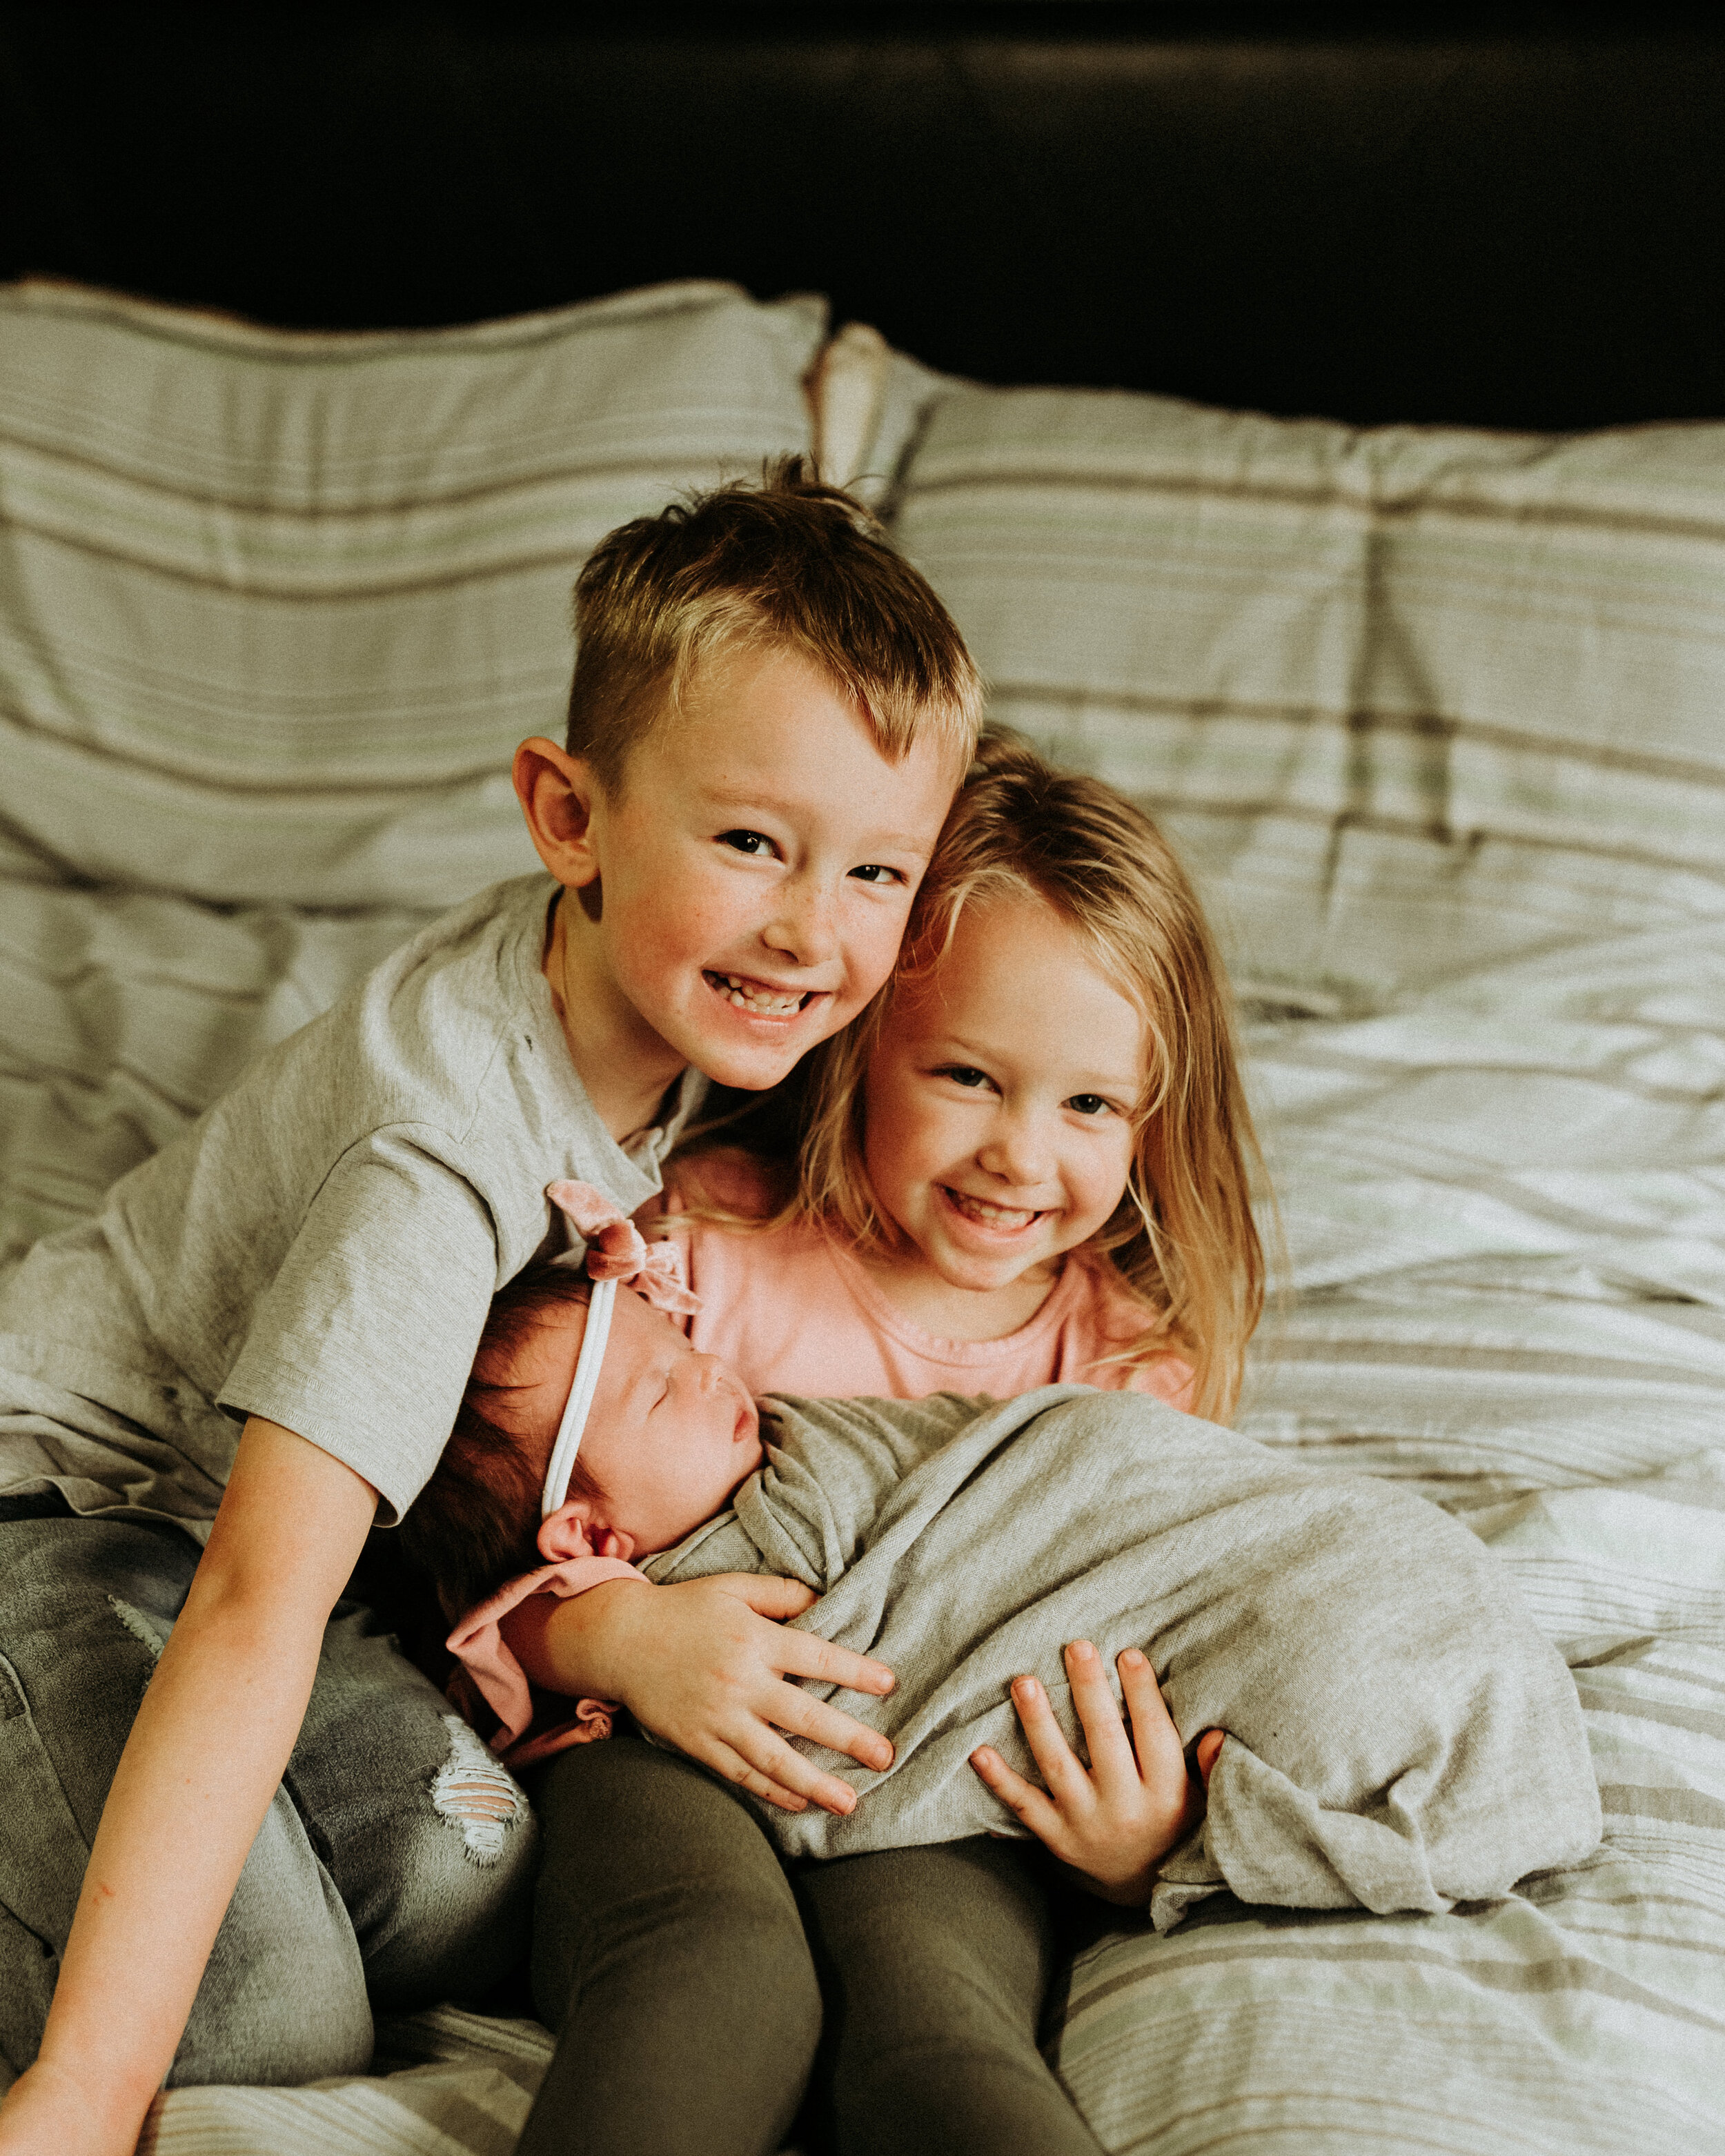 Newborn-Photographer-Bellingham-Wa-Brianne-Bell-Photography-(Dottie)-64.jpg